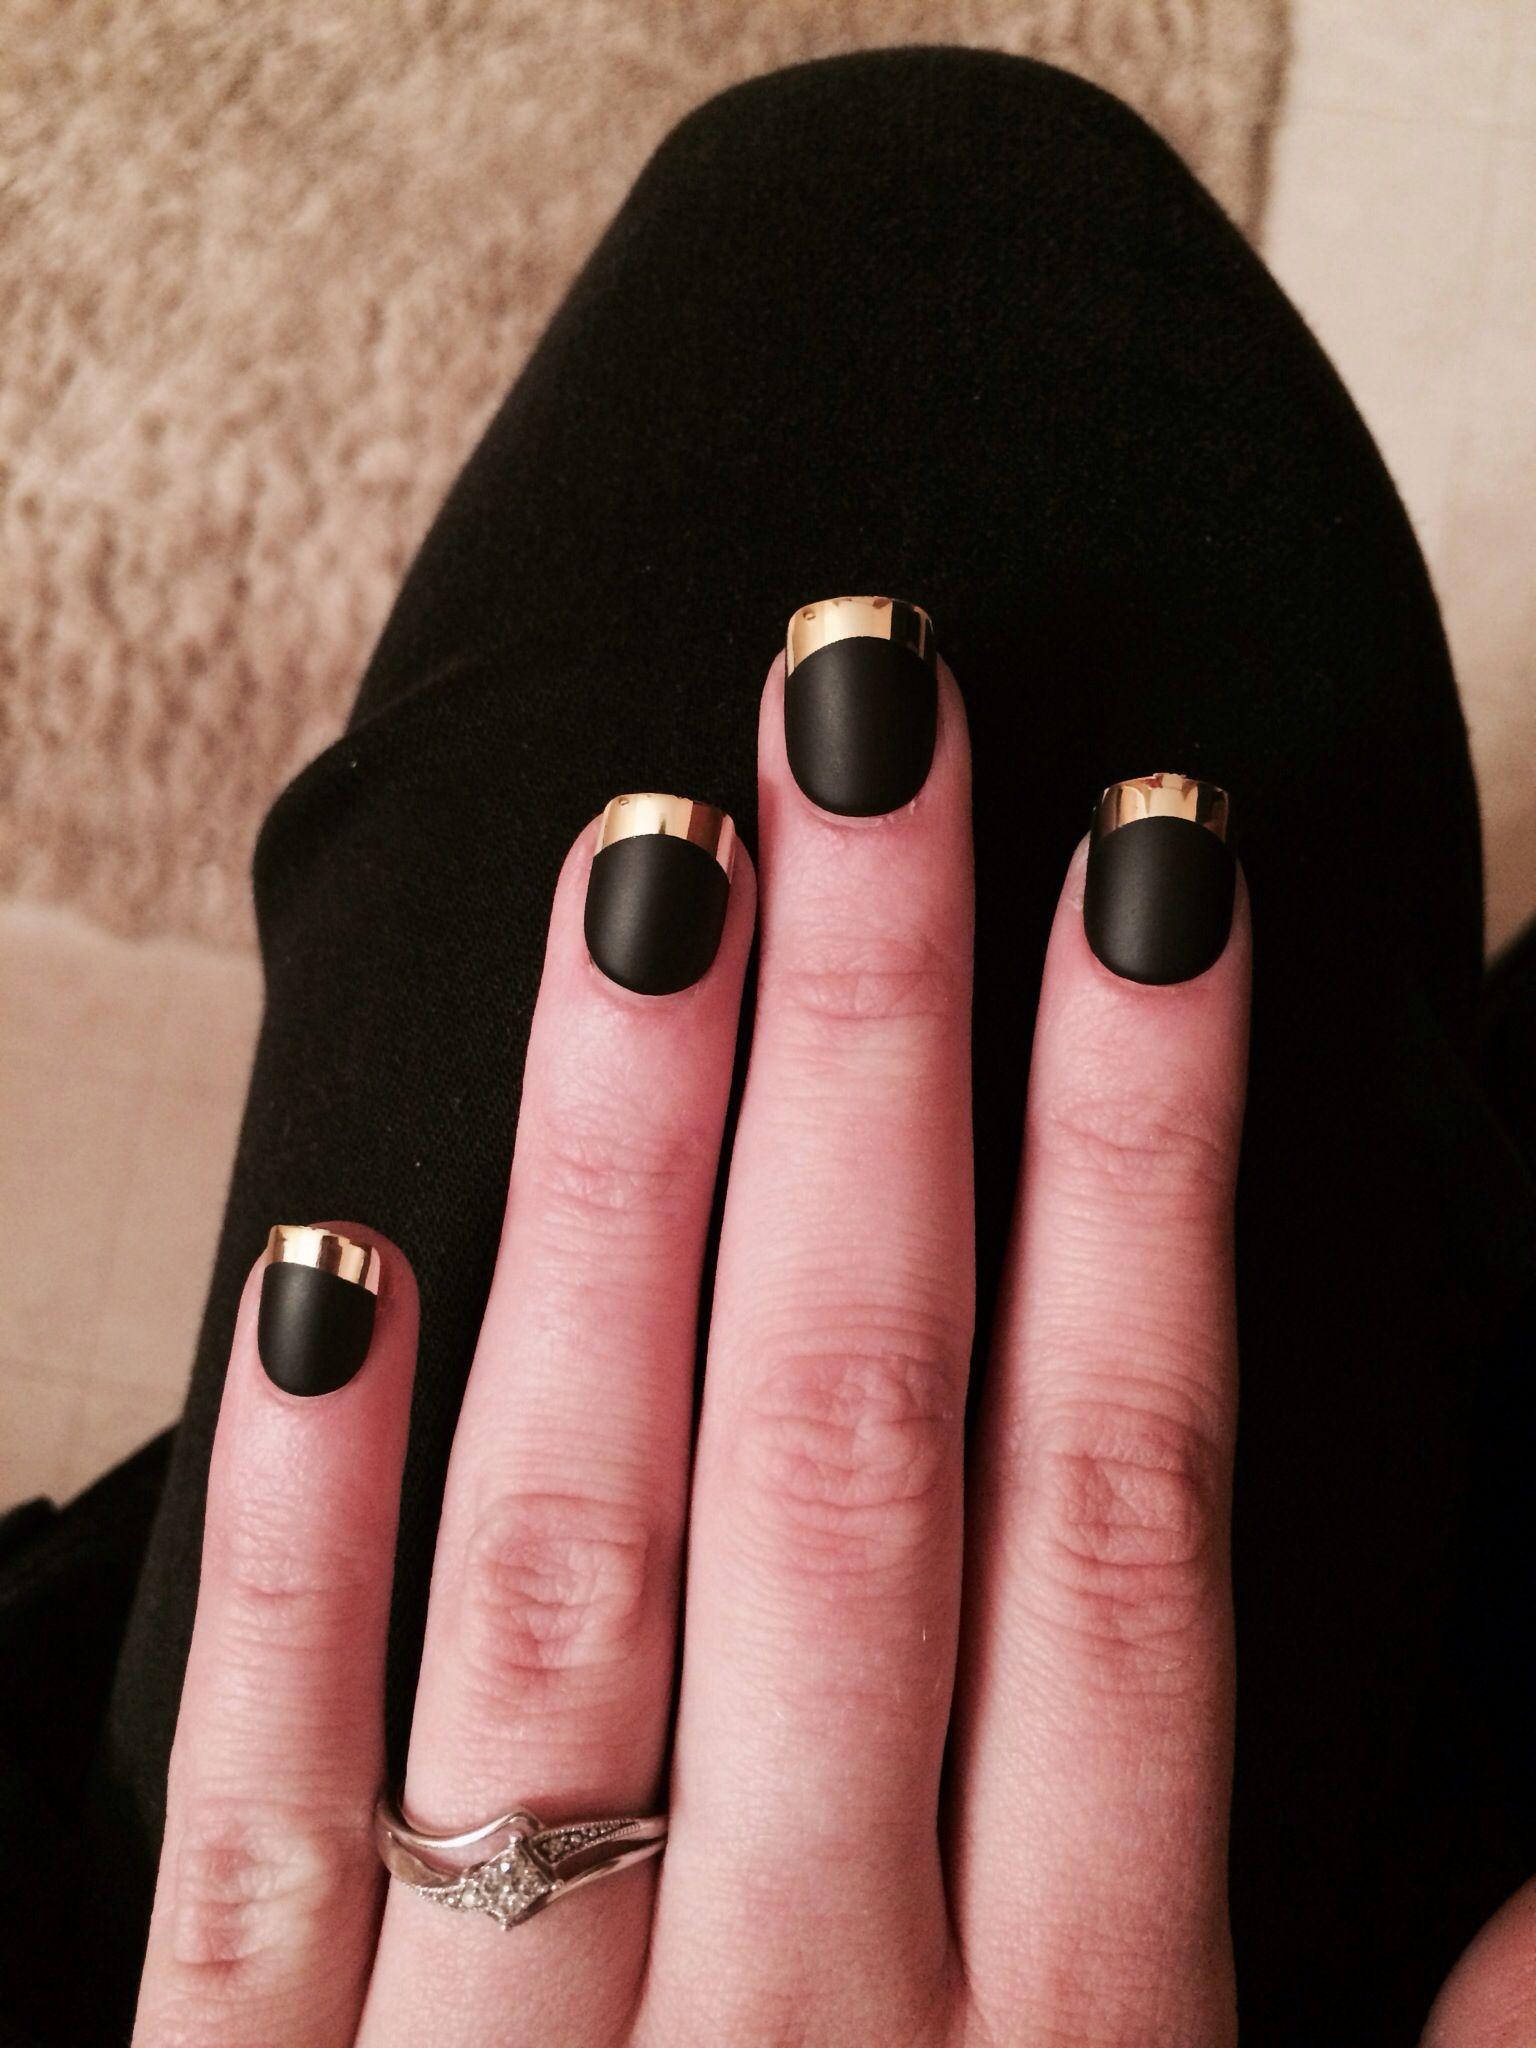 Matte black with gold tips. | Nails | Pinterest | Matte black ...